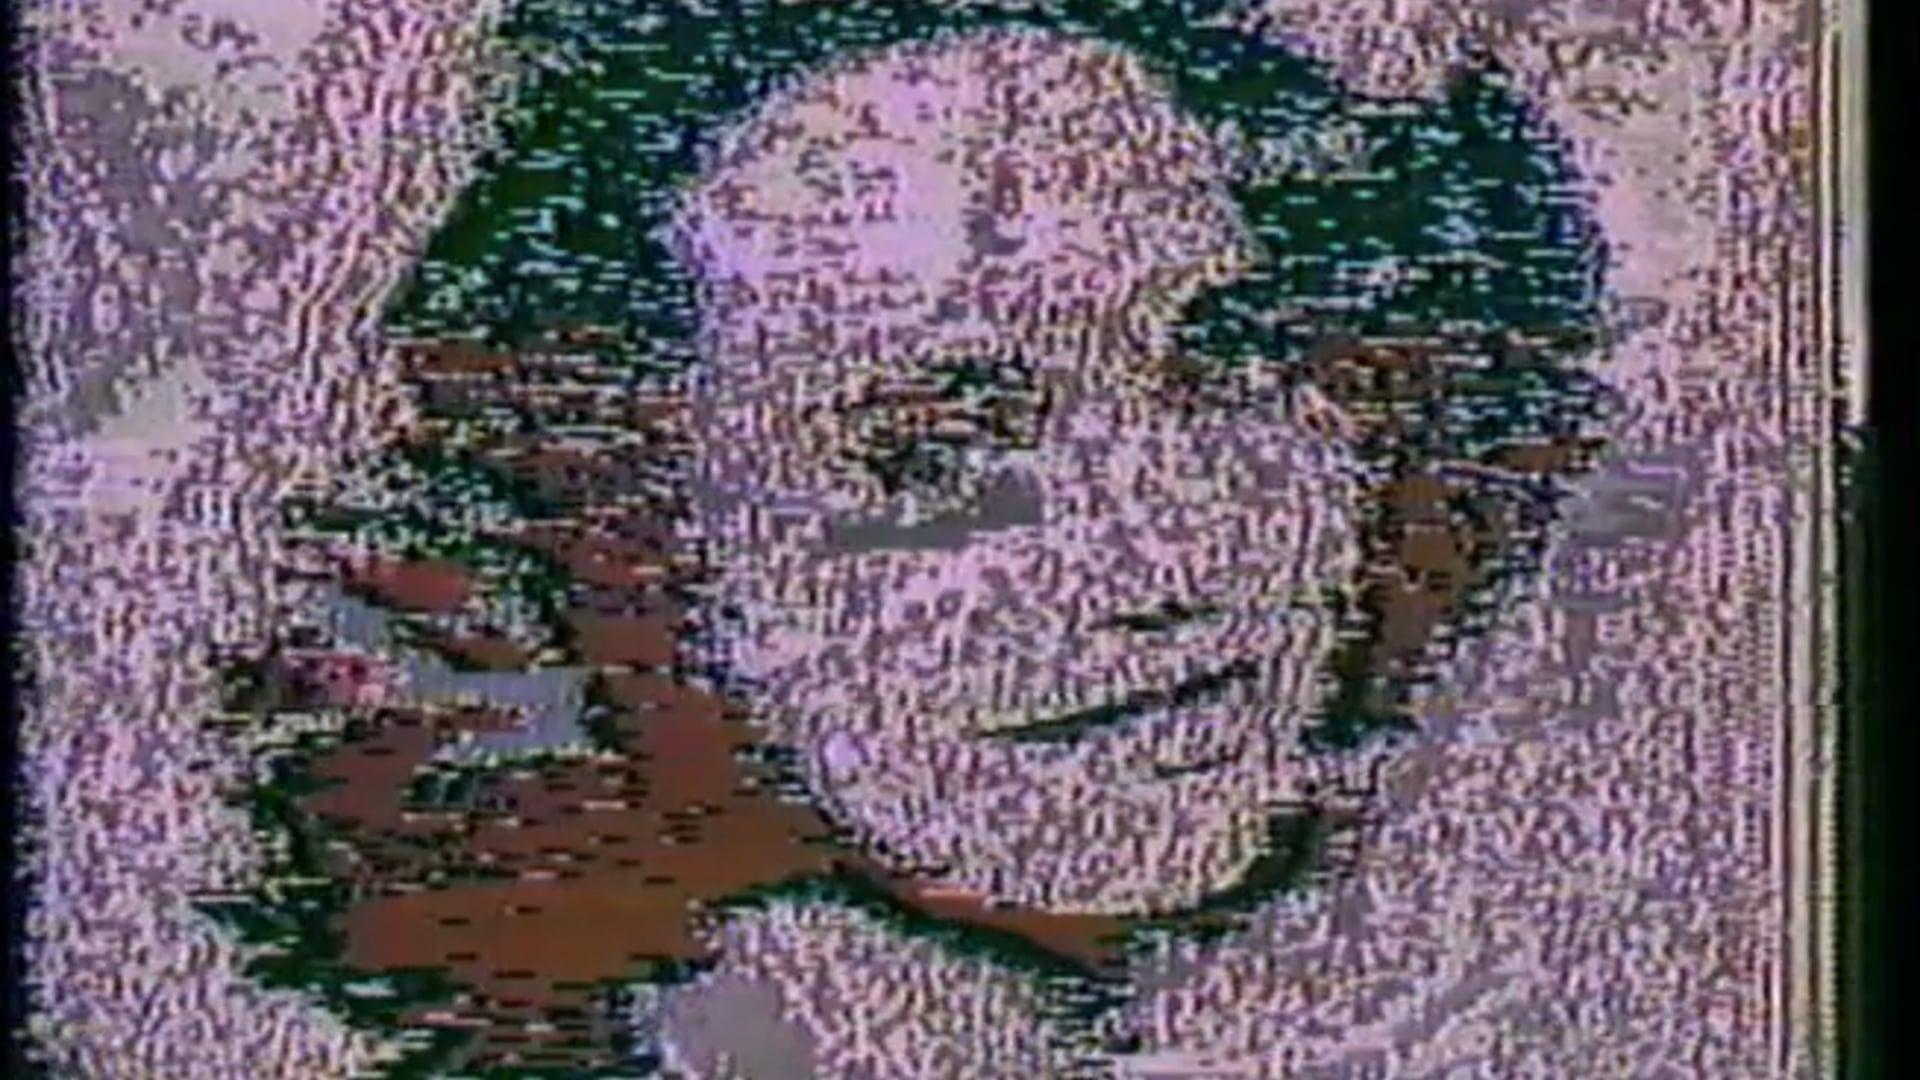 EXPERIMENTAL 1983